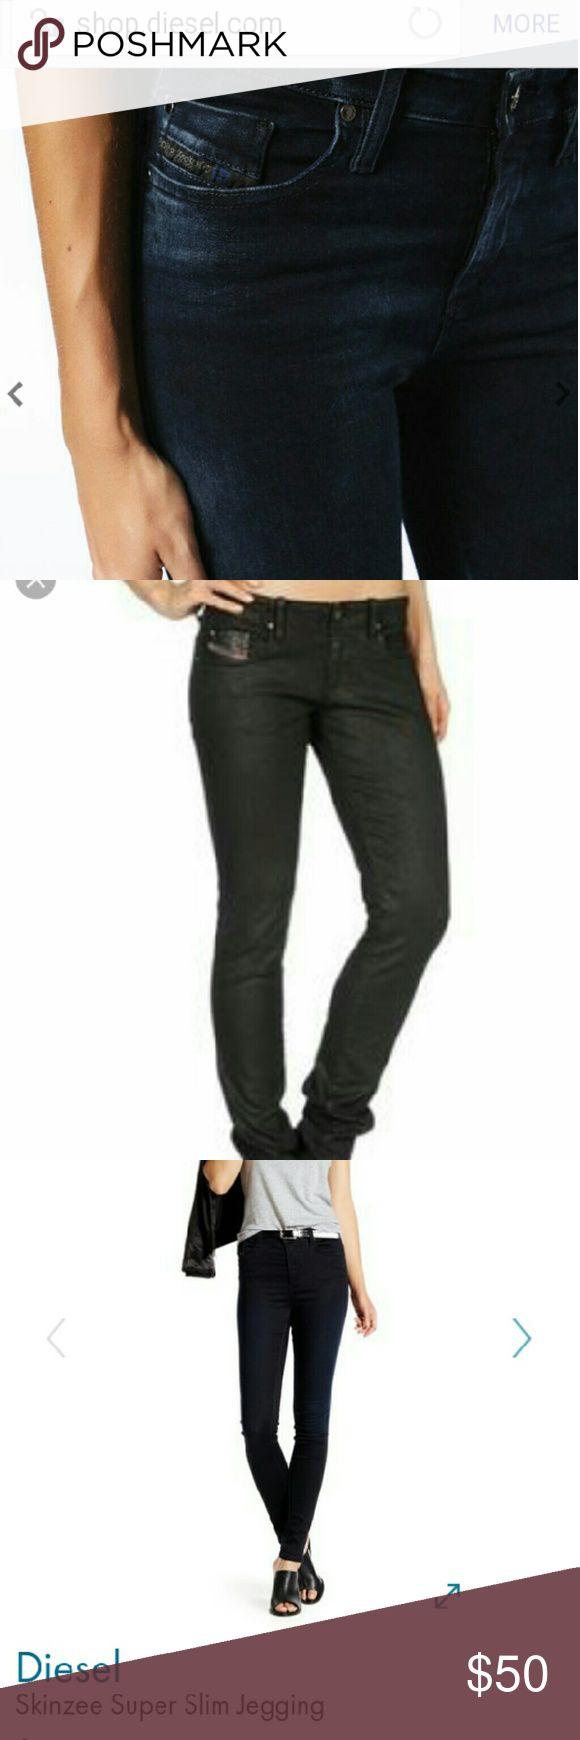 Diesel skinzee jeans Jegging legging jeans, sz 25/32. Stretch, but True to sz, regular waist. Diesel Jeans Skinny